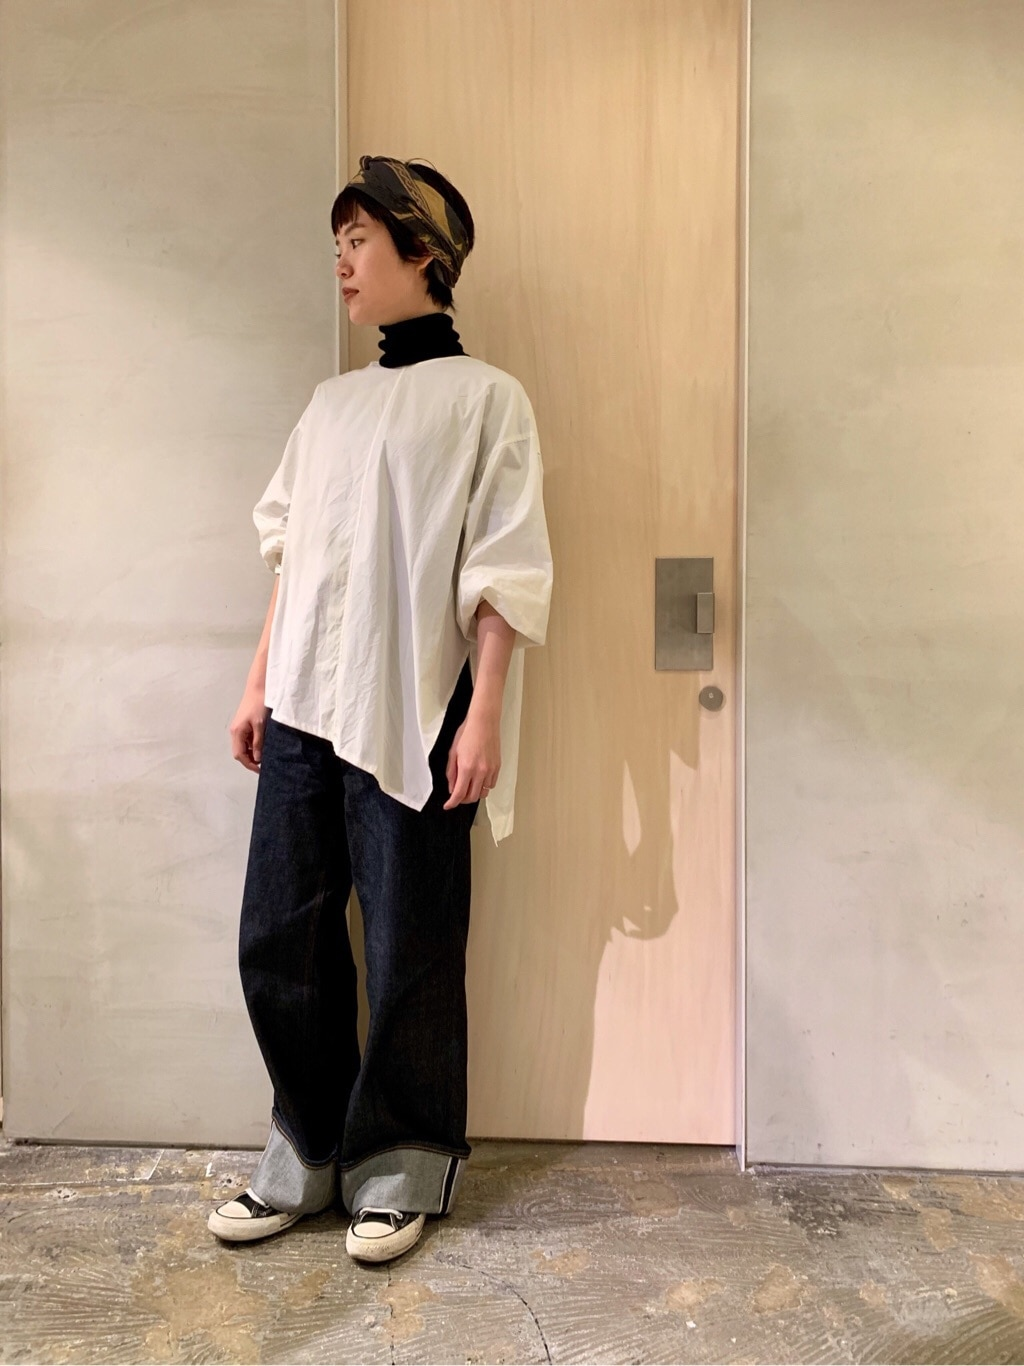 AMBIDEX アトリエ 身長:162cm 2019.11.27